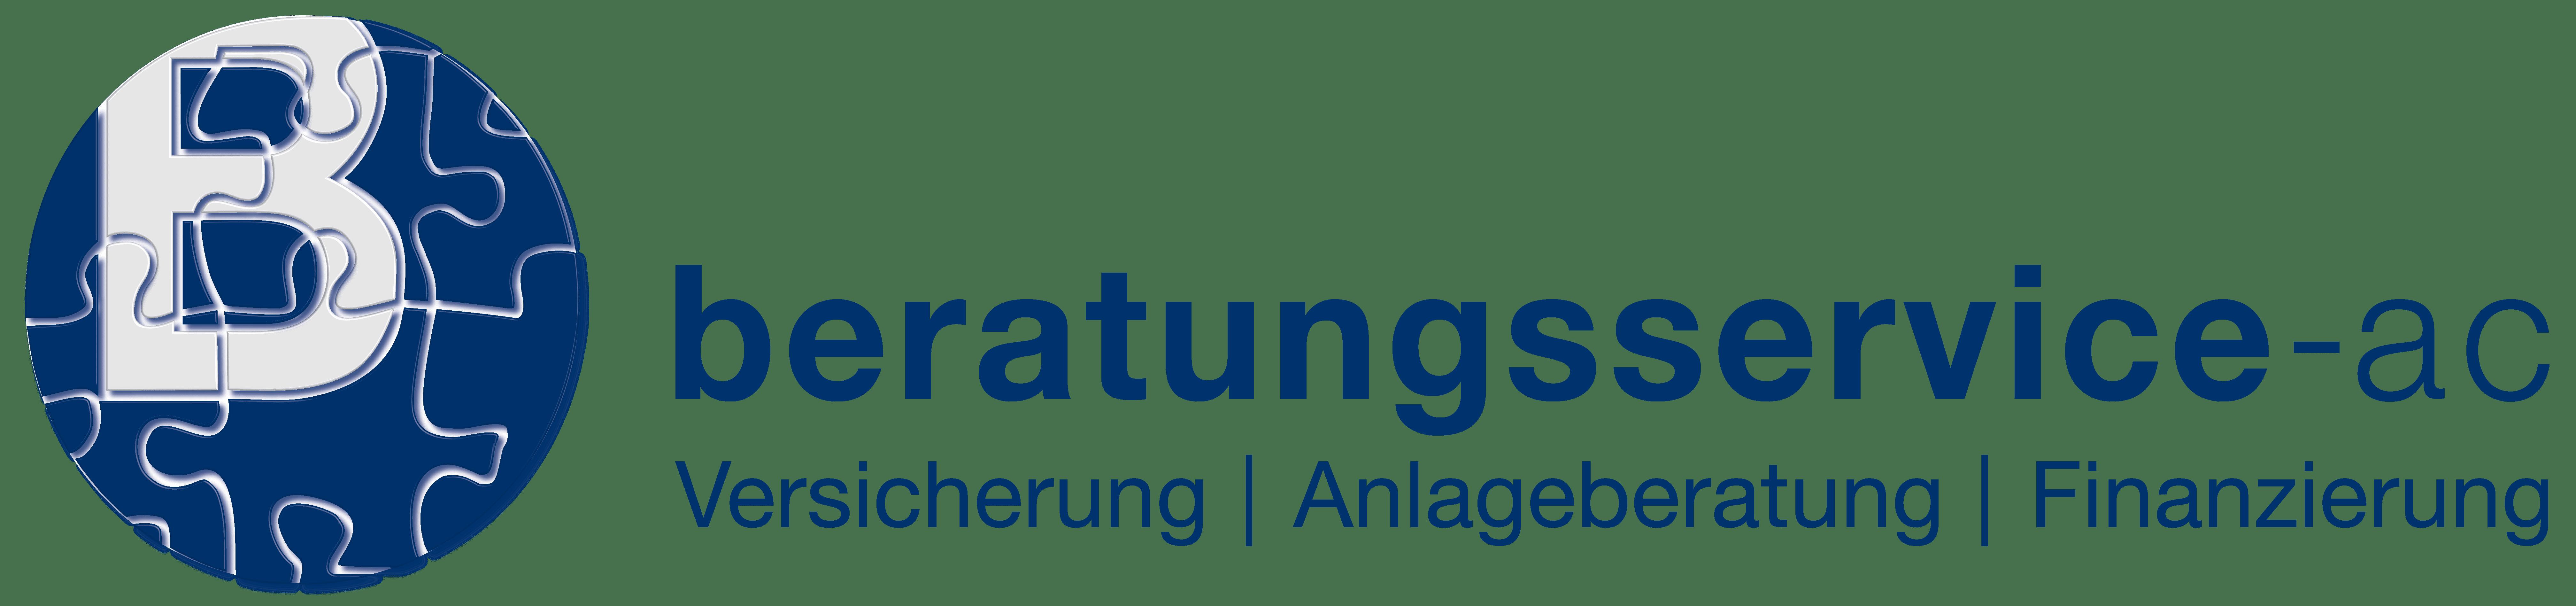 Beratungsservice-ac GmbH Michael Becker